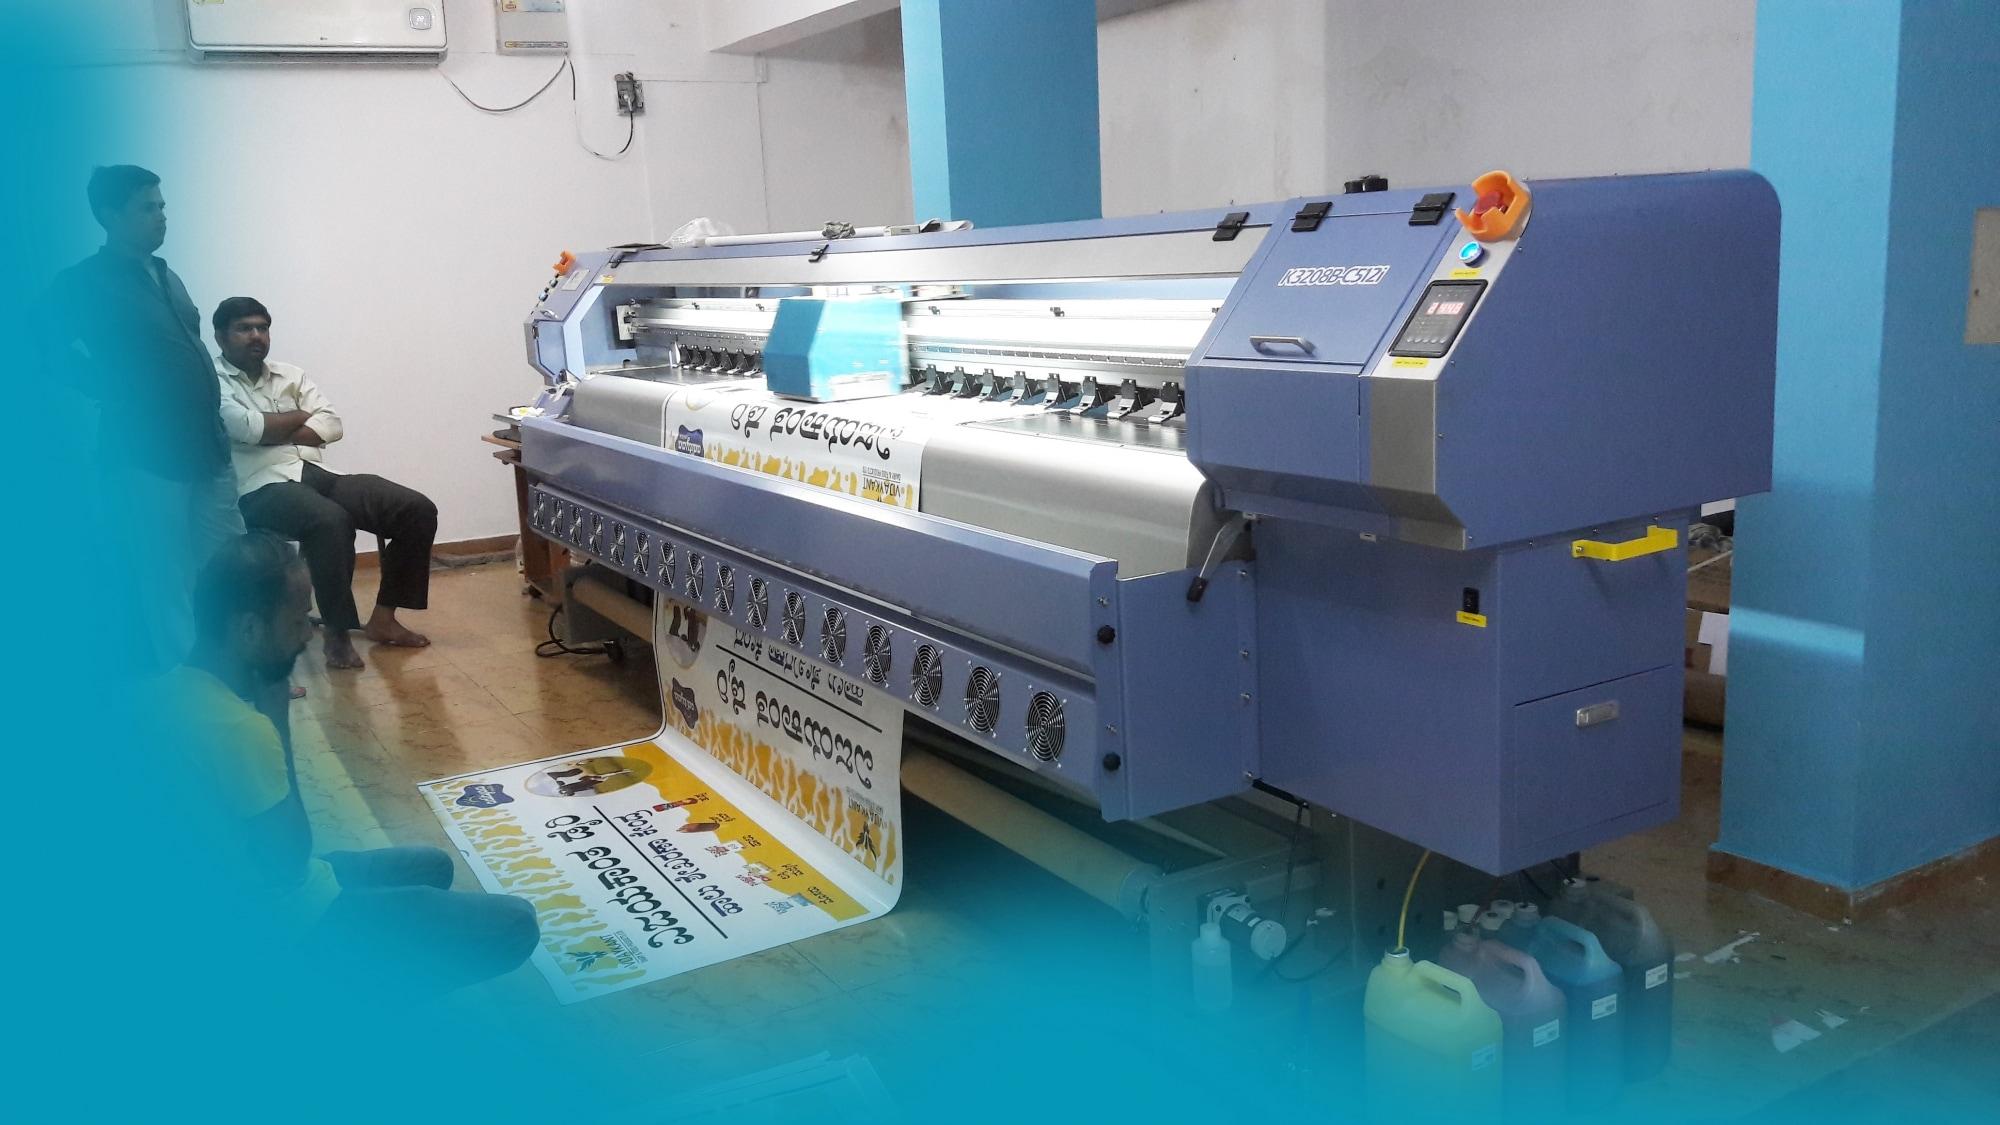 Top 50 Printers For Visiting Card in Khade Bazaar - Best Visiting ...